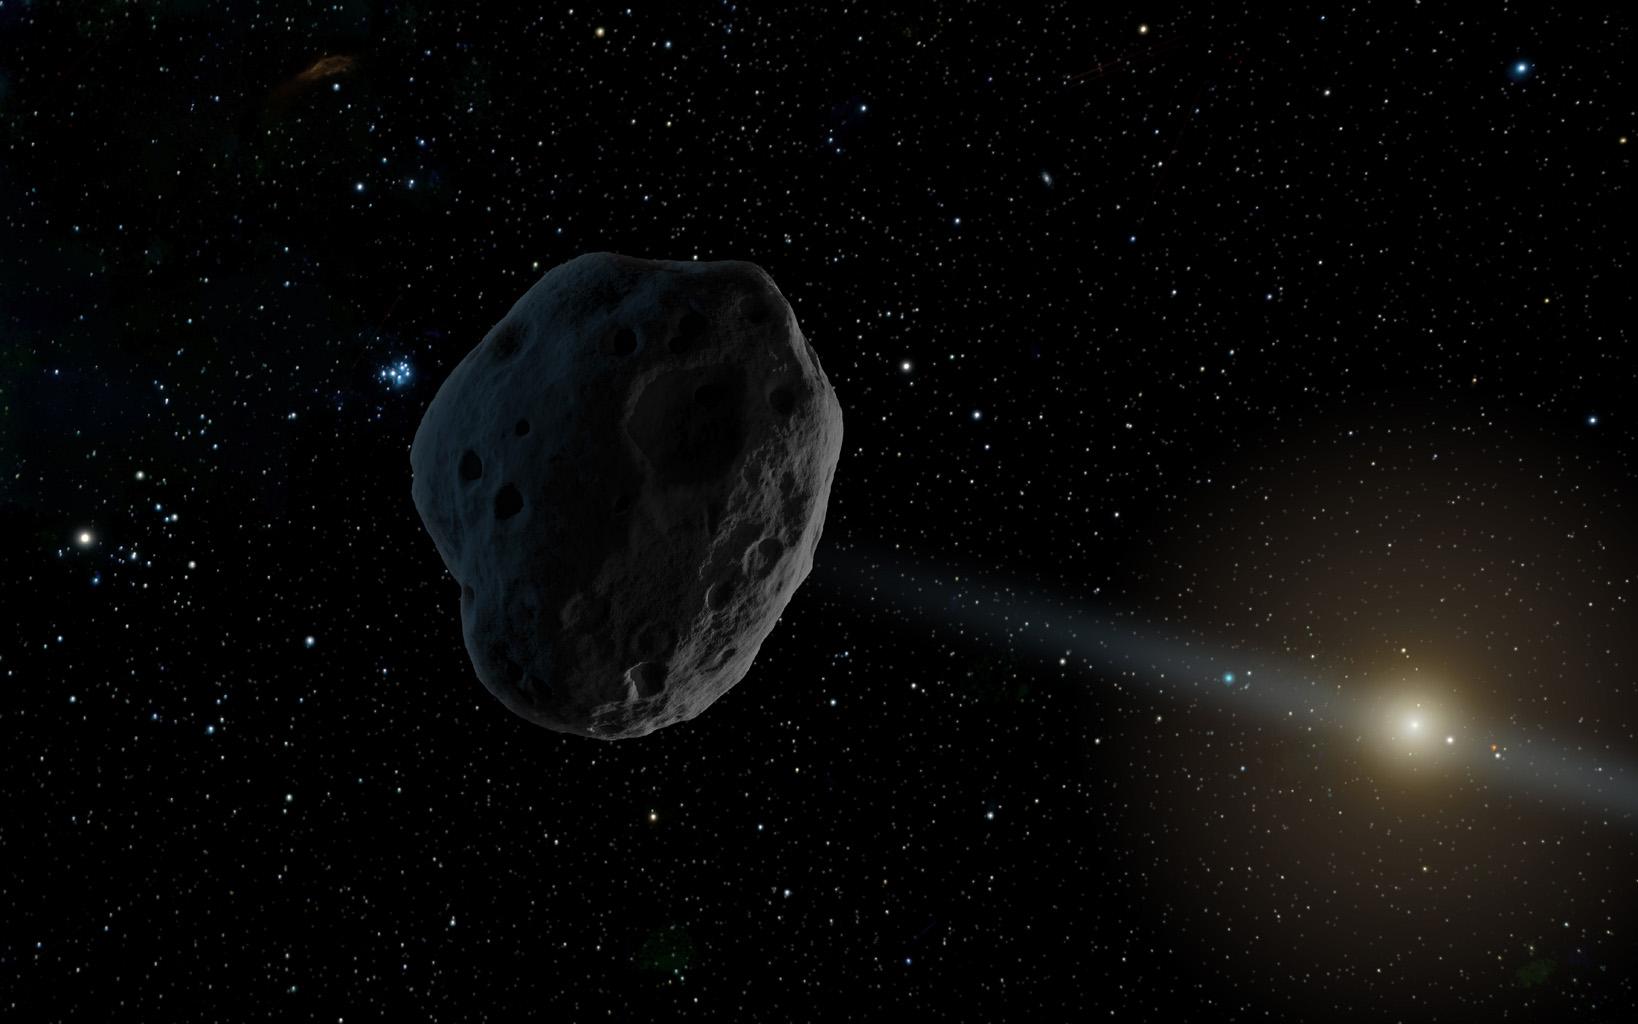 2016 WF9 asteroide o cometa